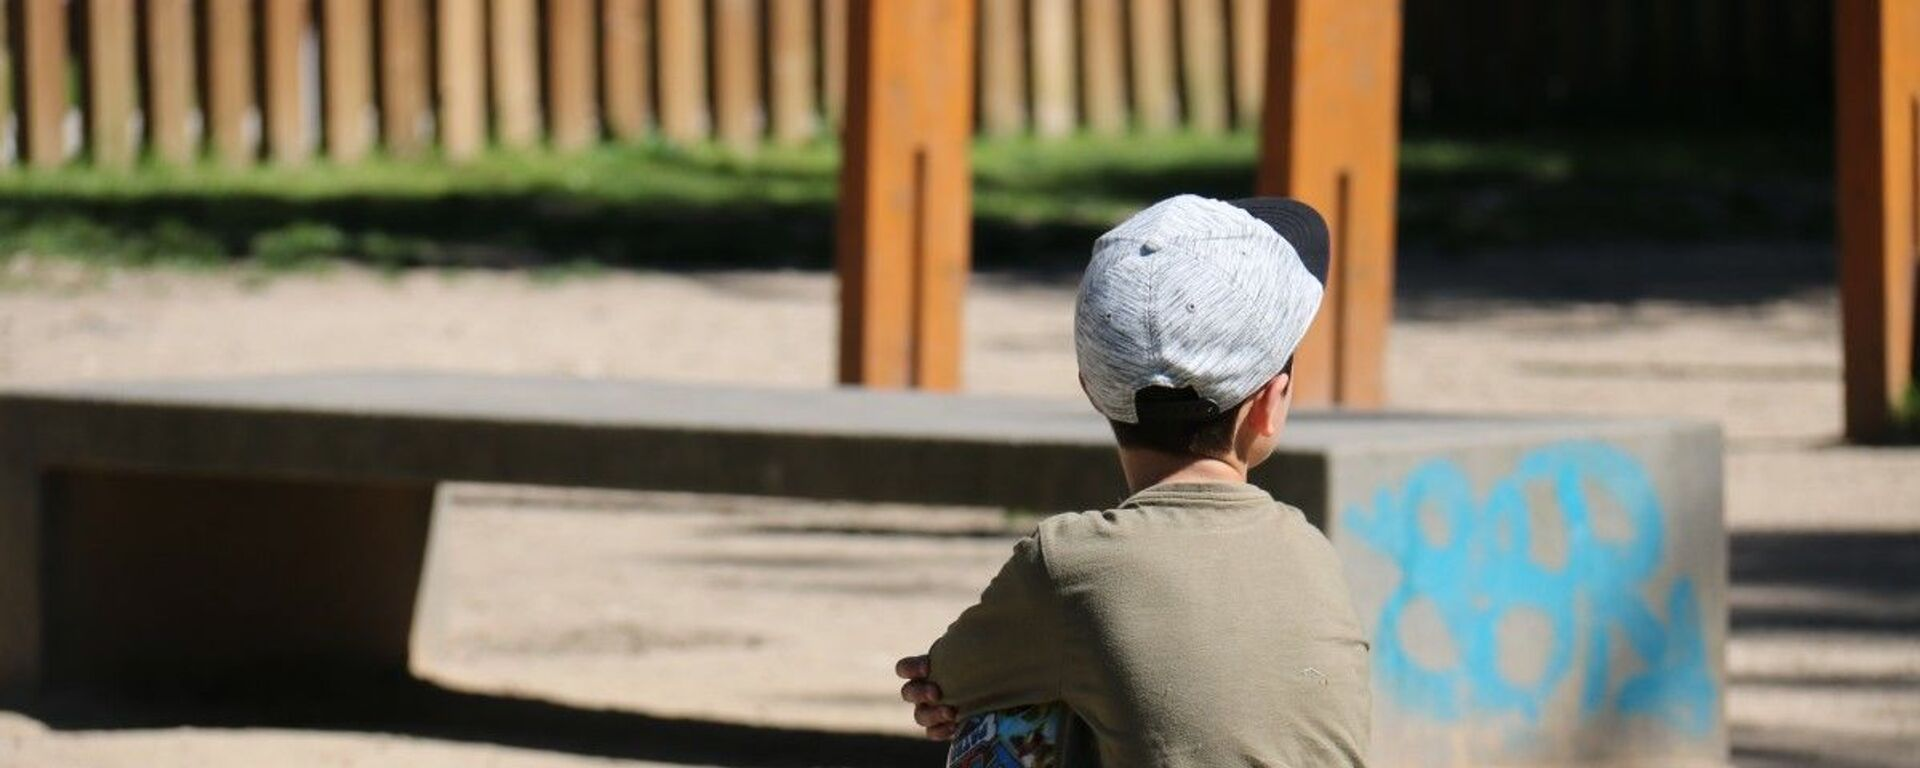 Одинокий ребенок на улице, архивное фото - Sputnik Тоҷикистон, 1920, 22.09.2021